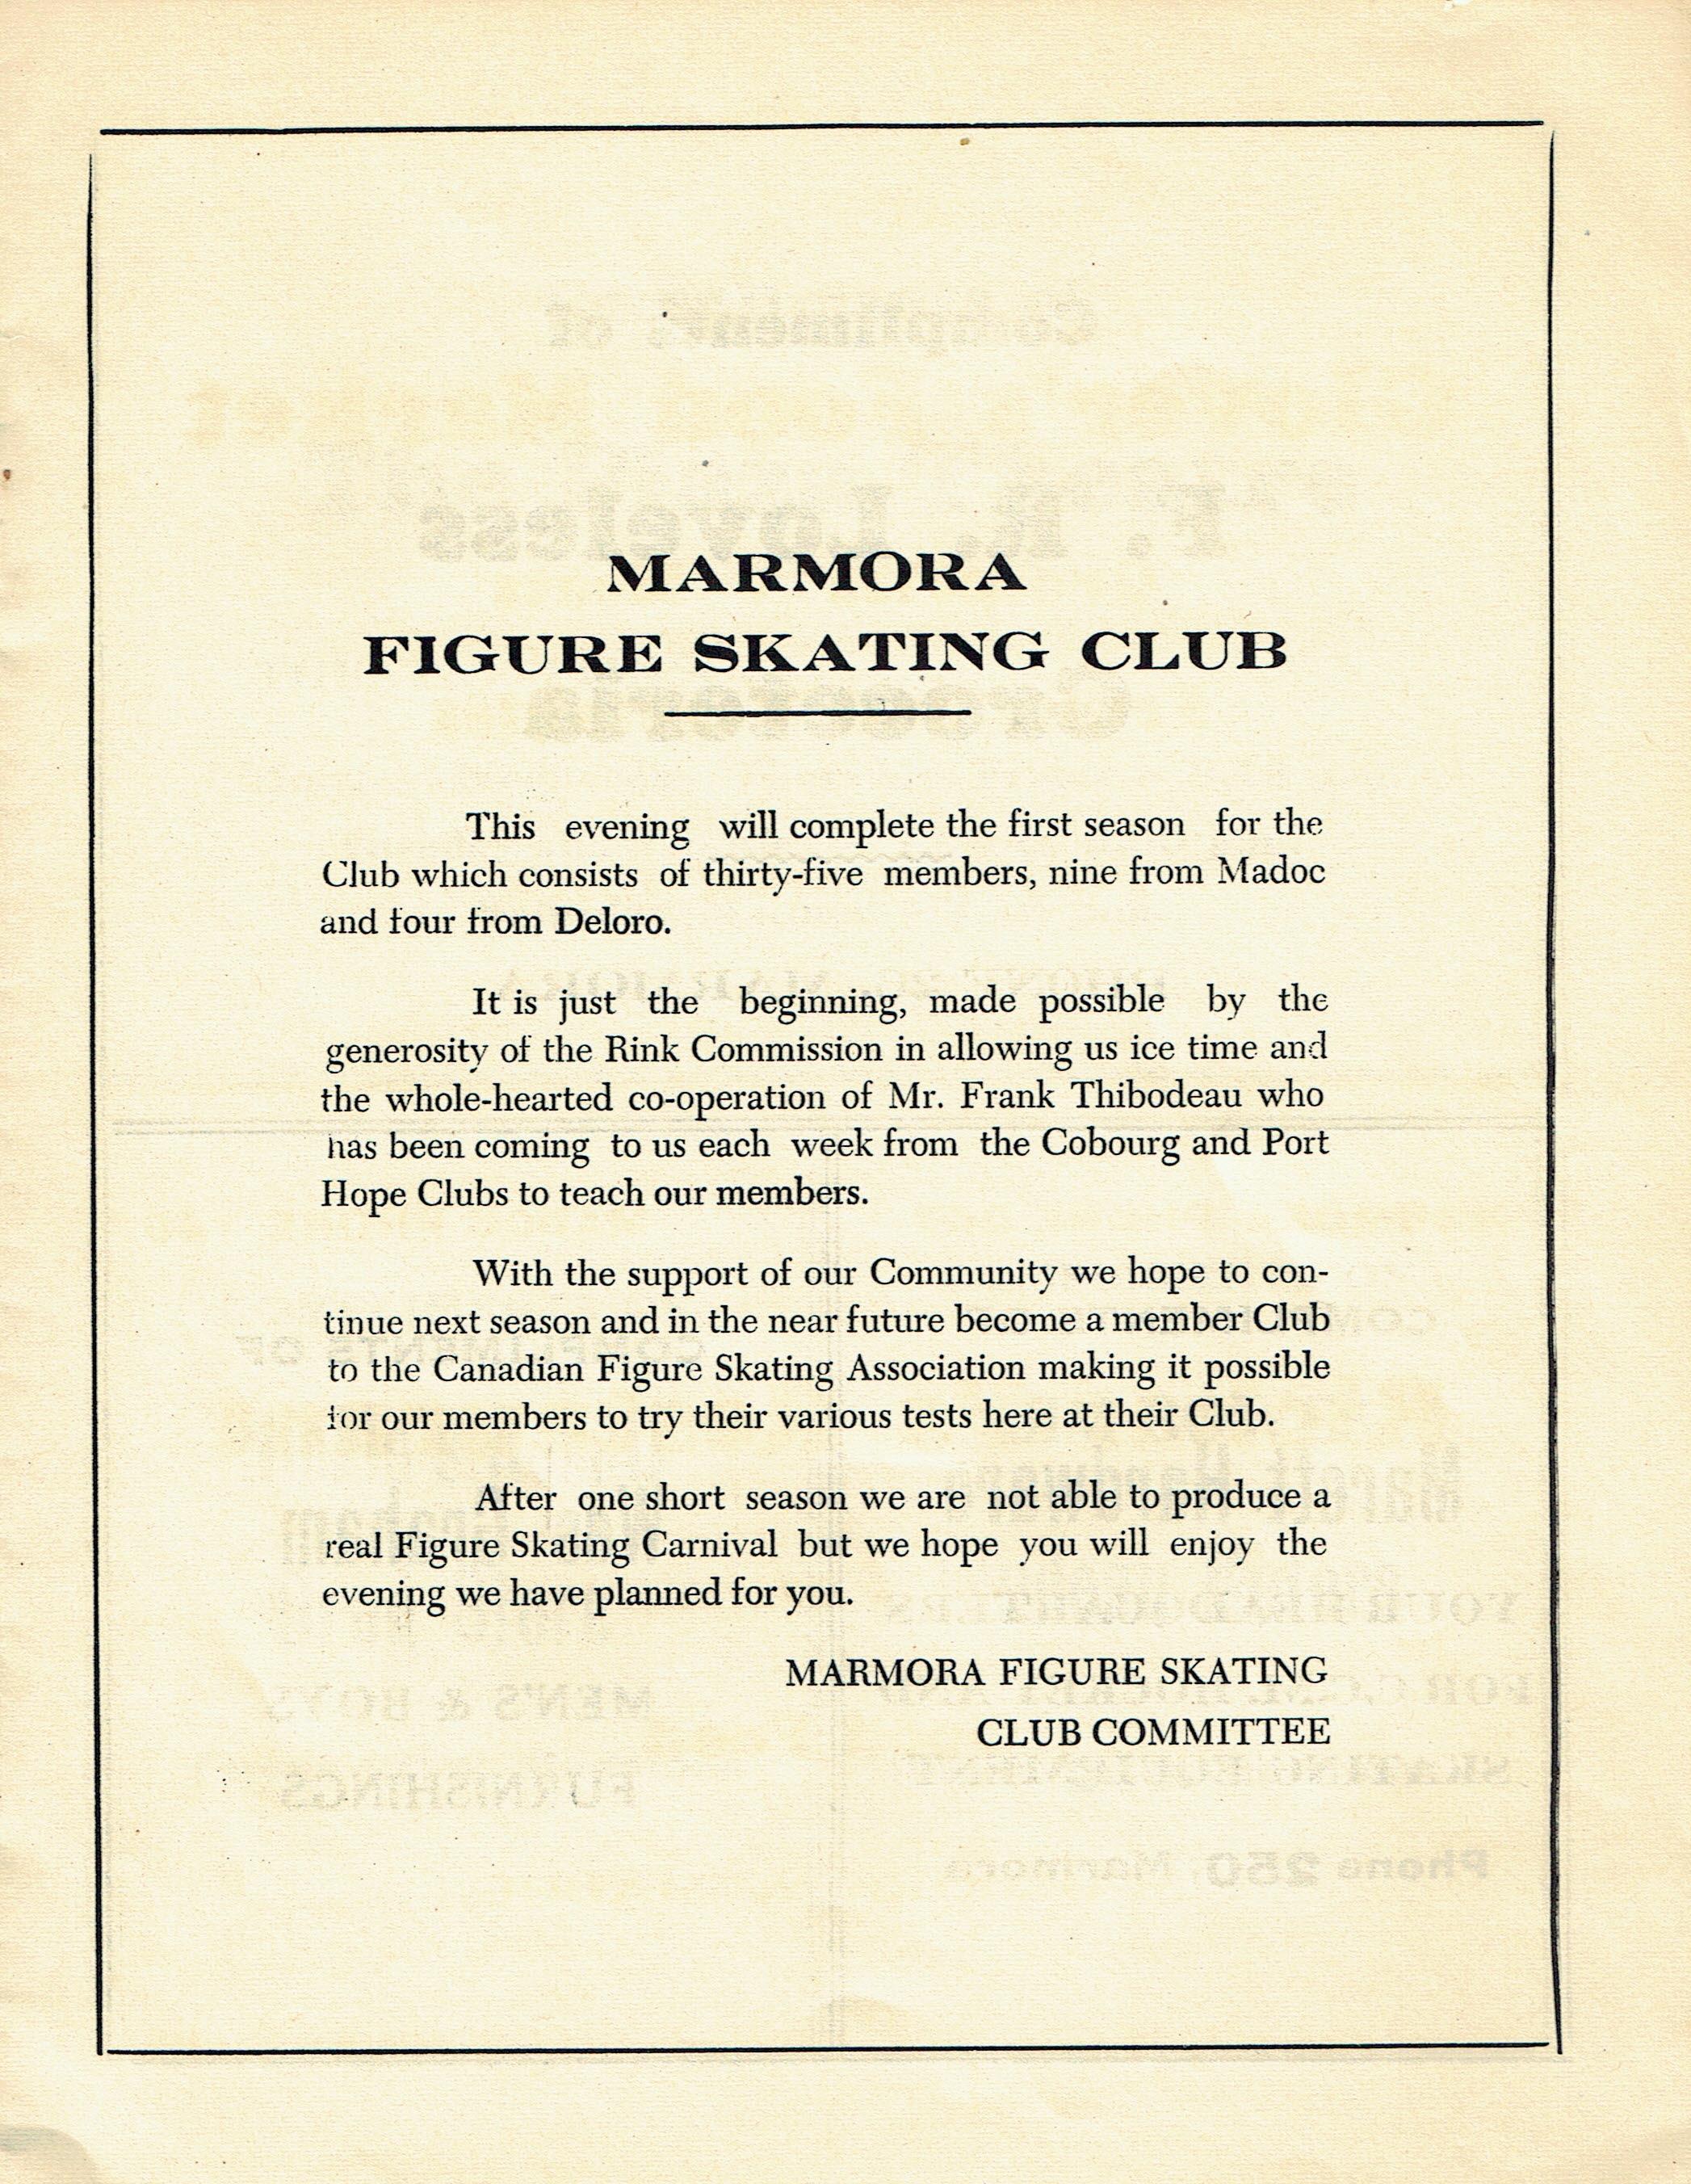 1955 Figure skating Club (2).jpg